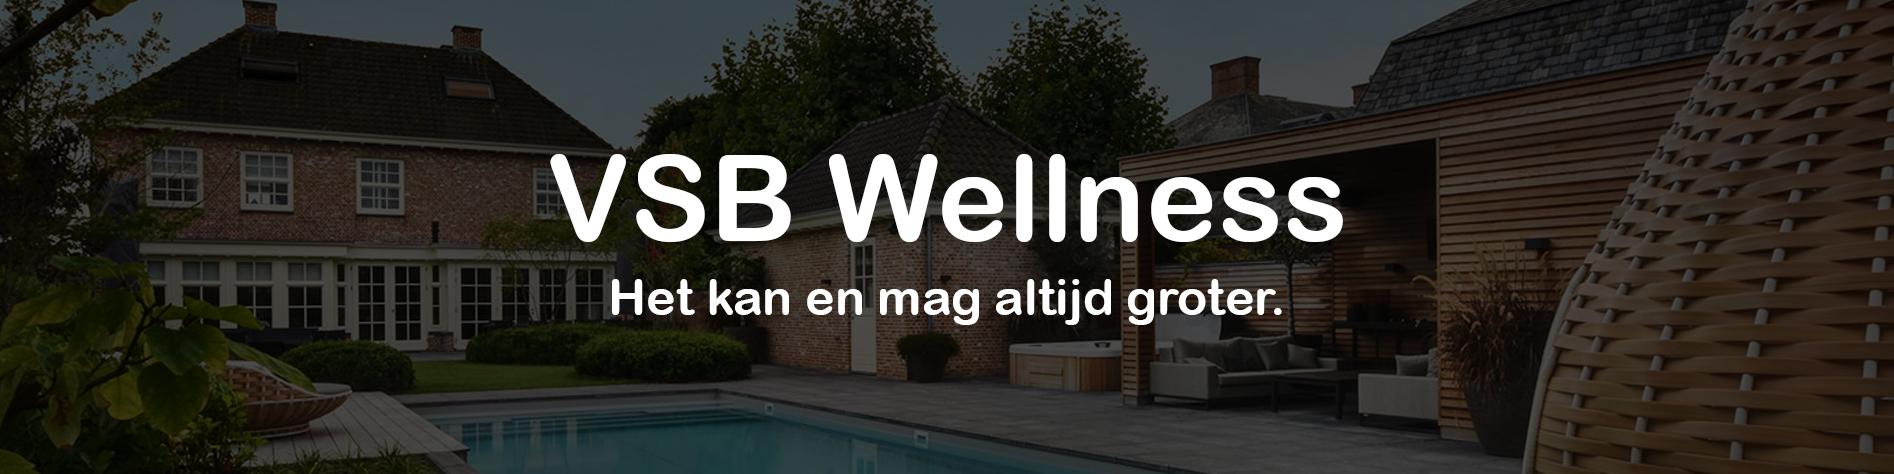 VSB wellness